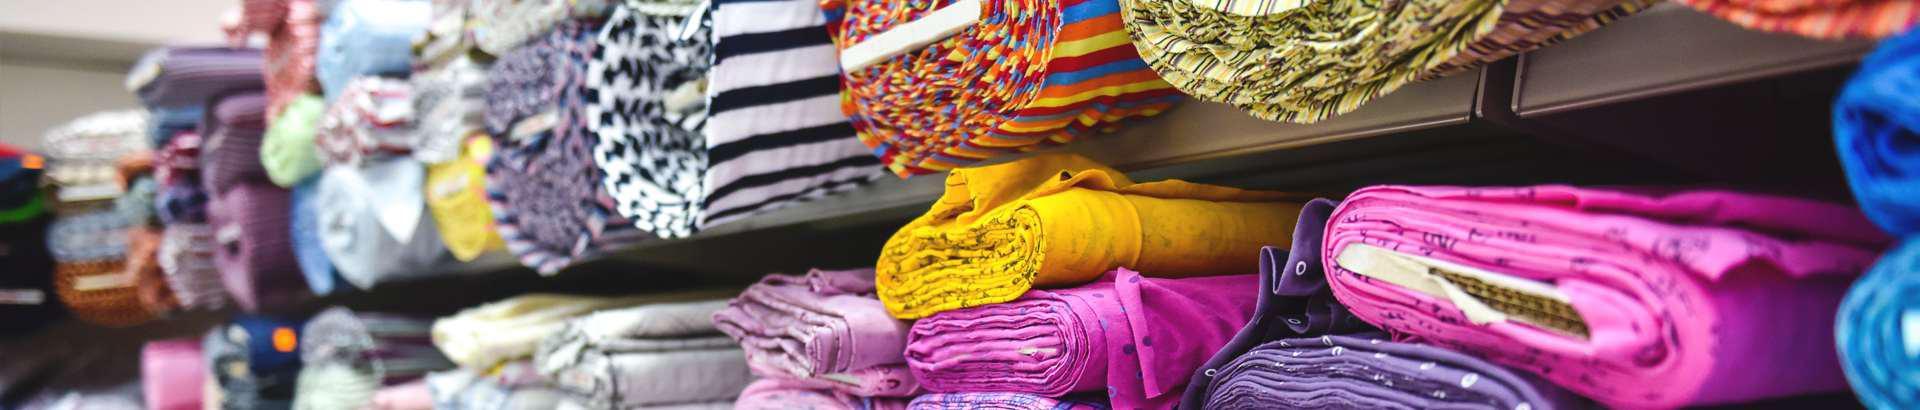 10396312_abakhan-fabrics-eesti-as_86179562_xl.jpg